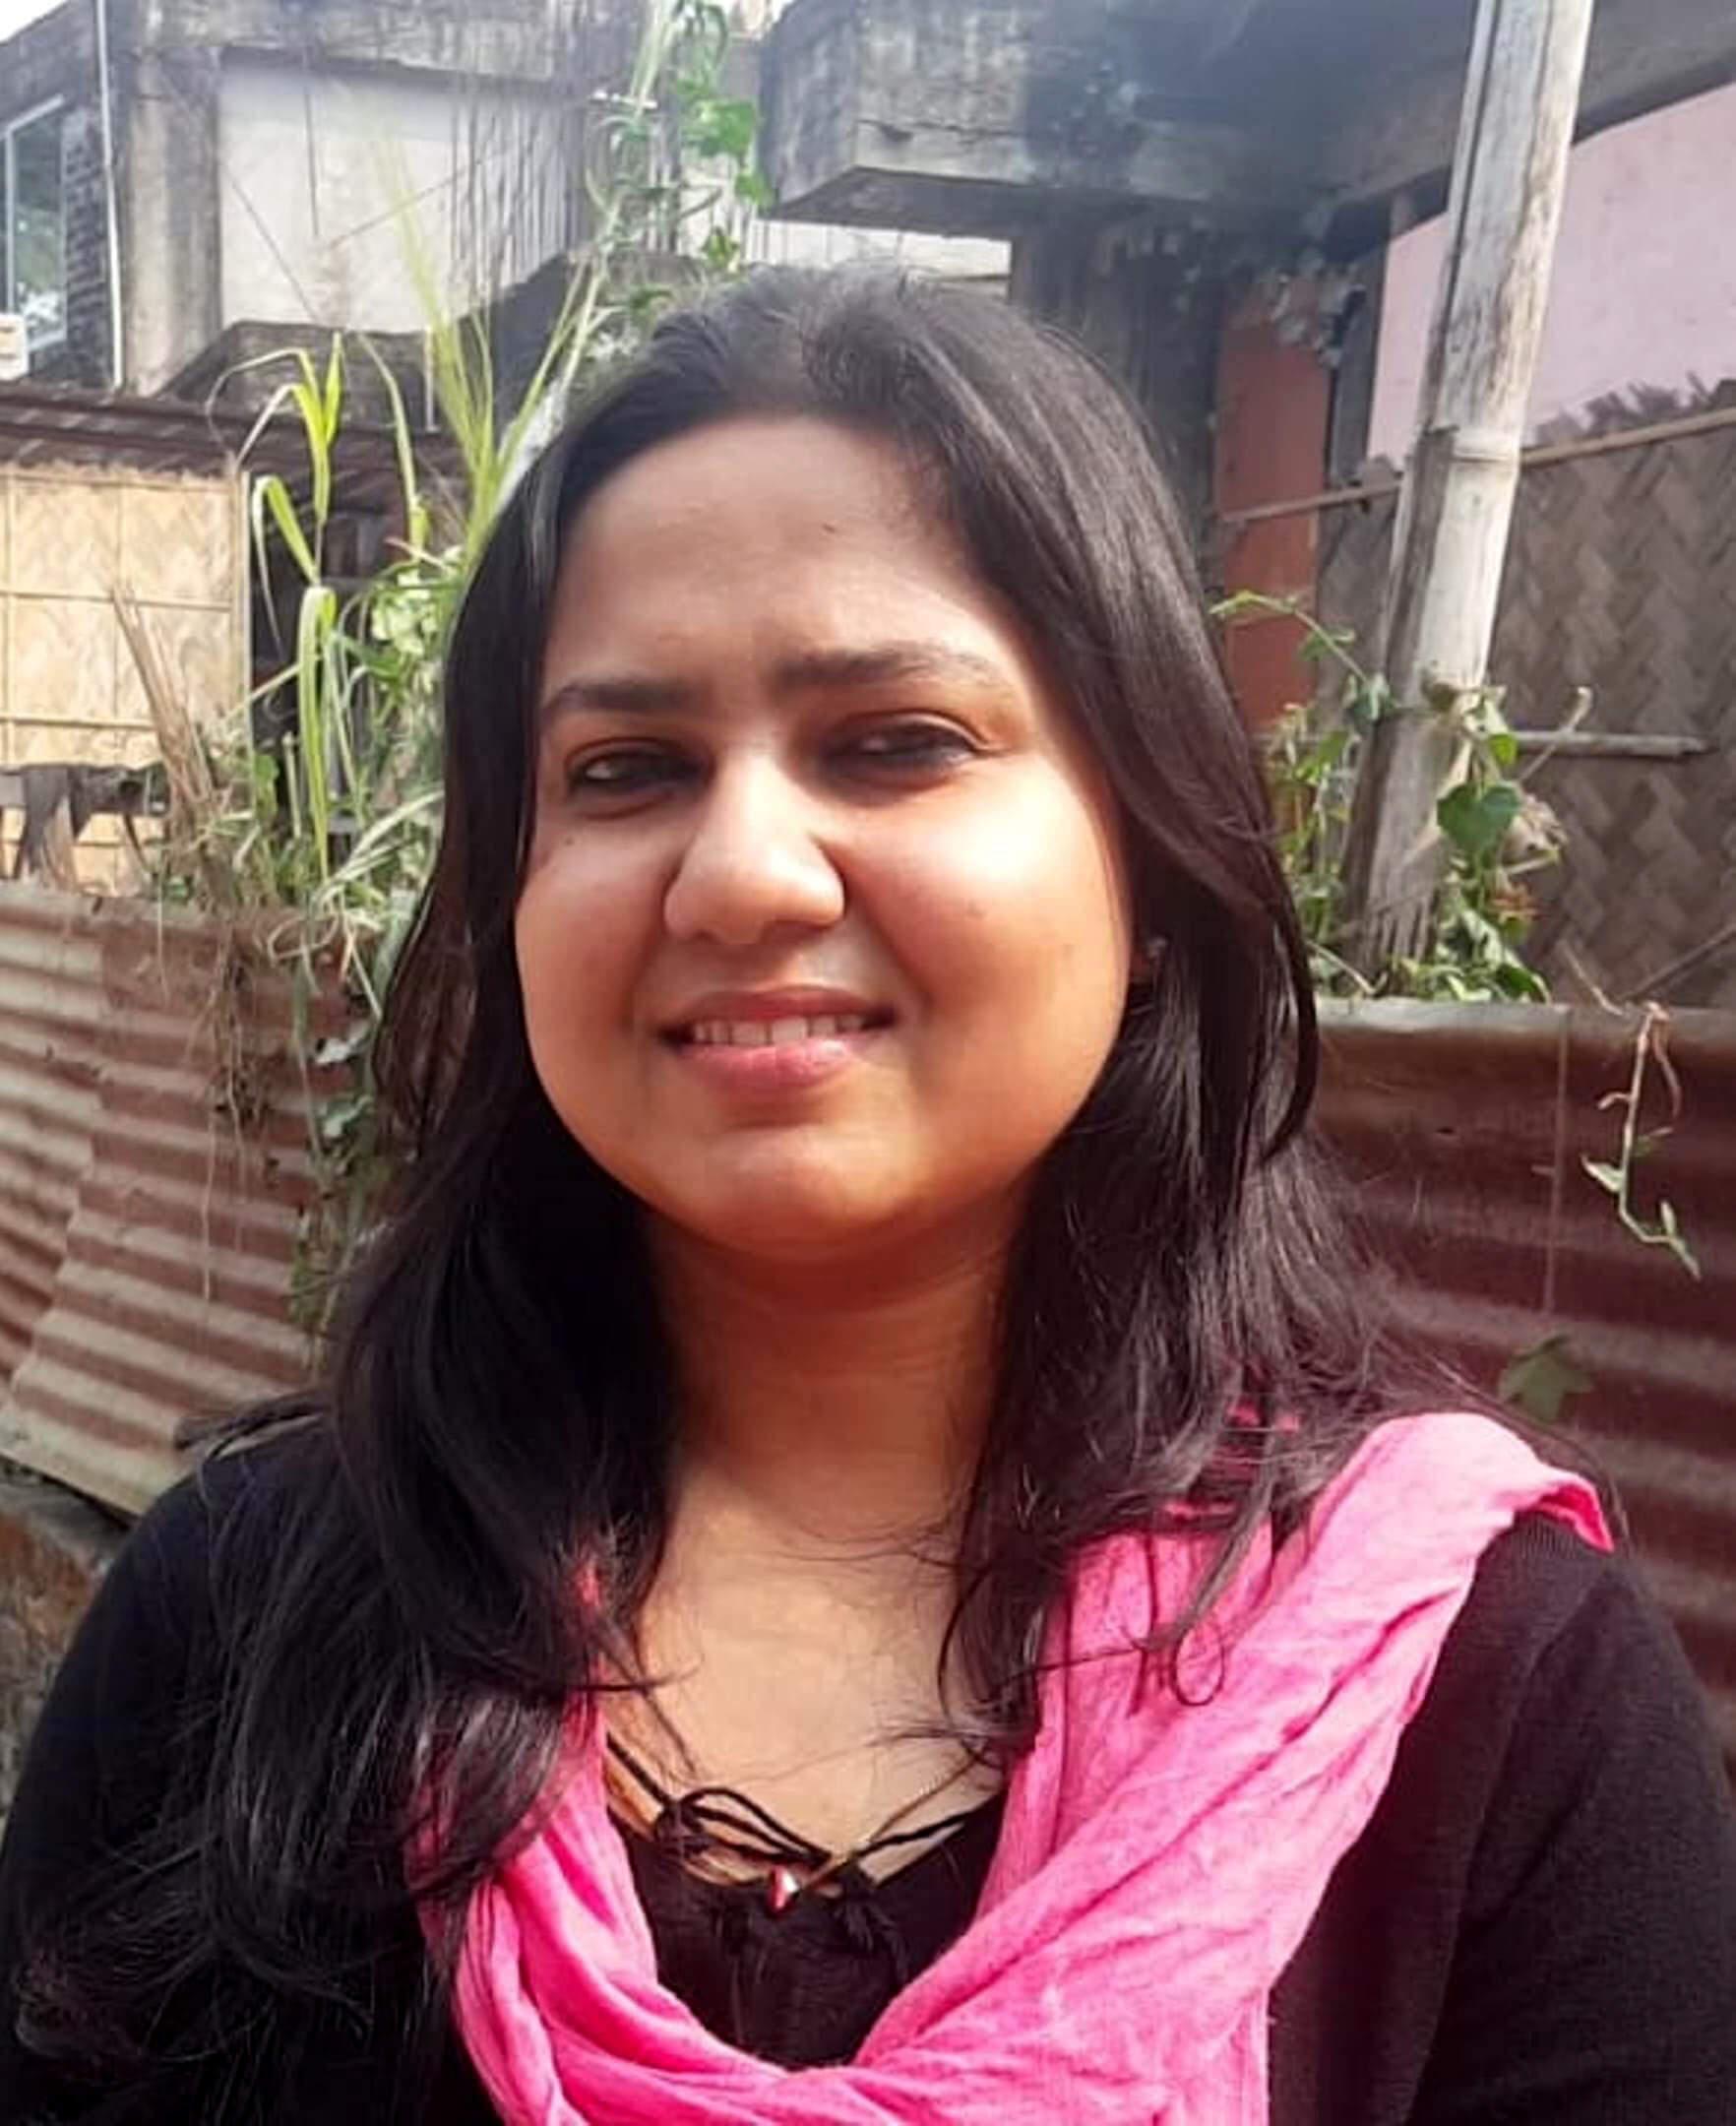 Assam Civil Service Examination (ACS) topper Maria Tanim felicitated